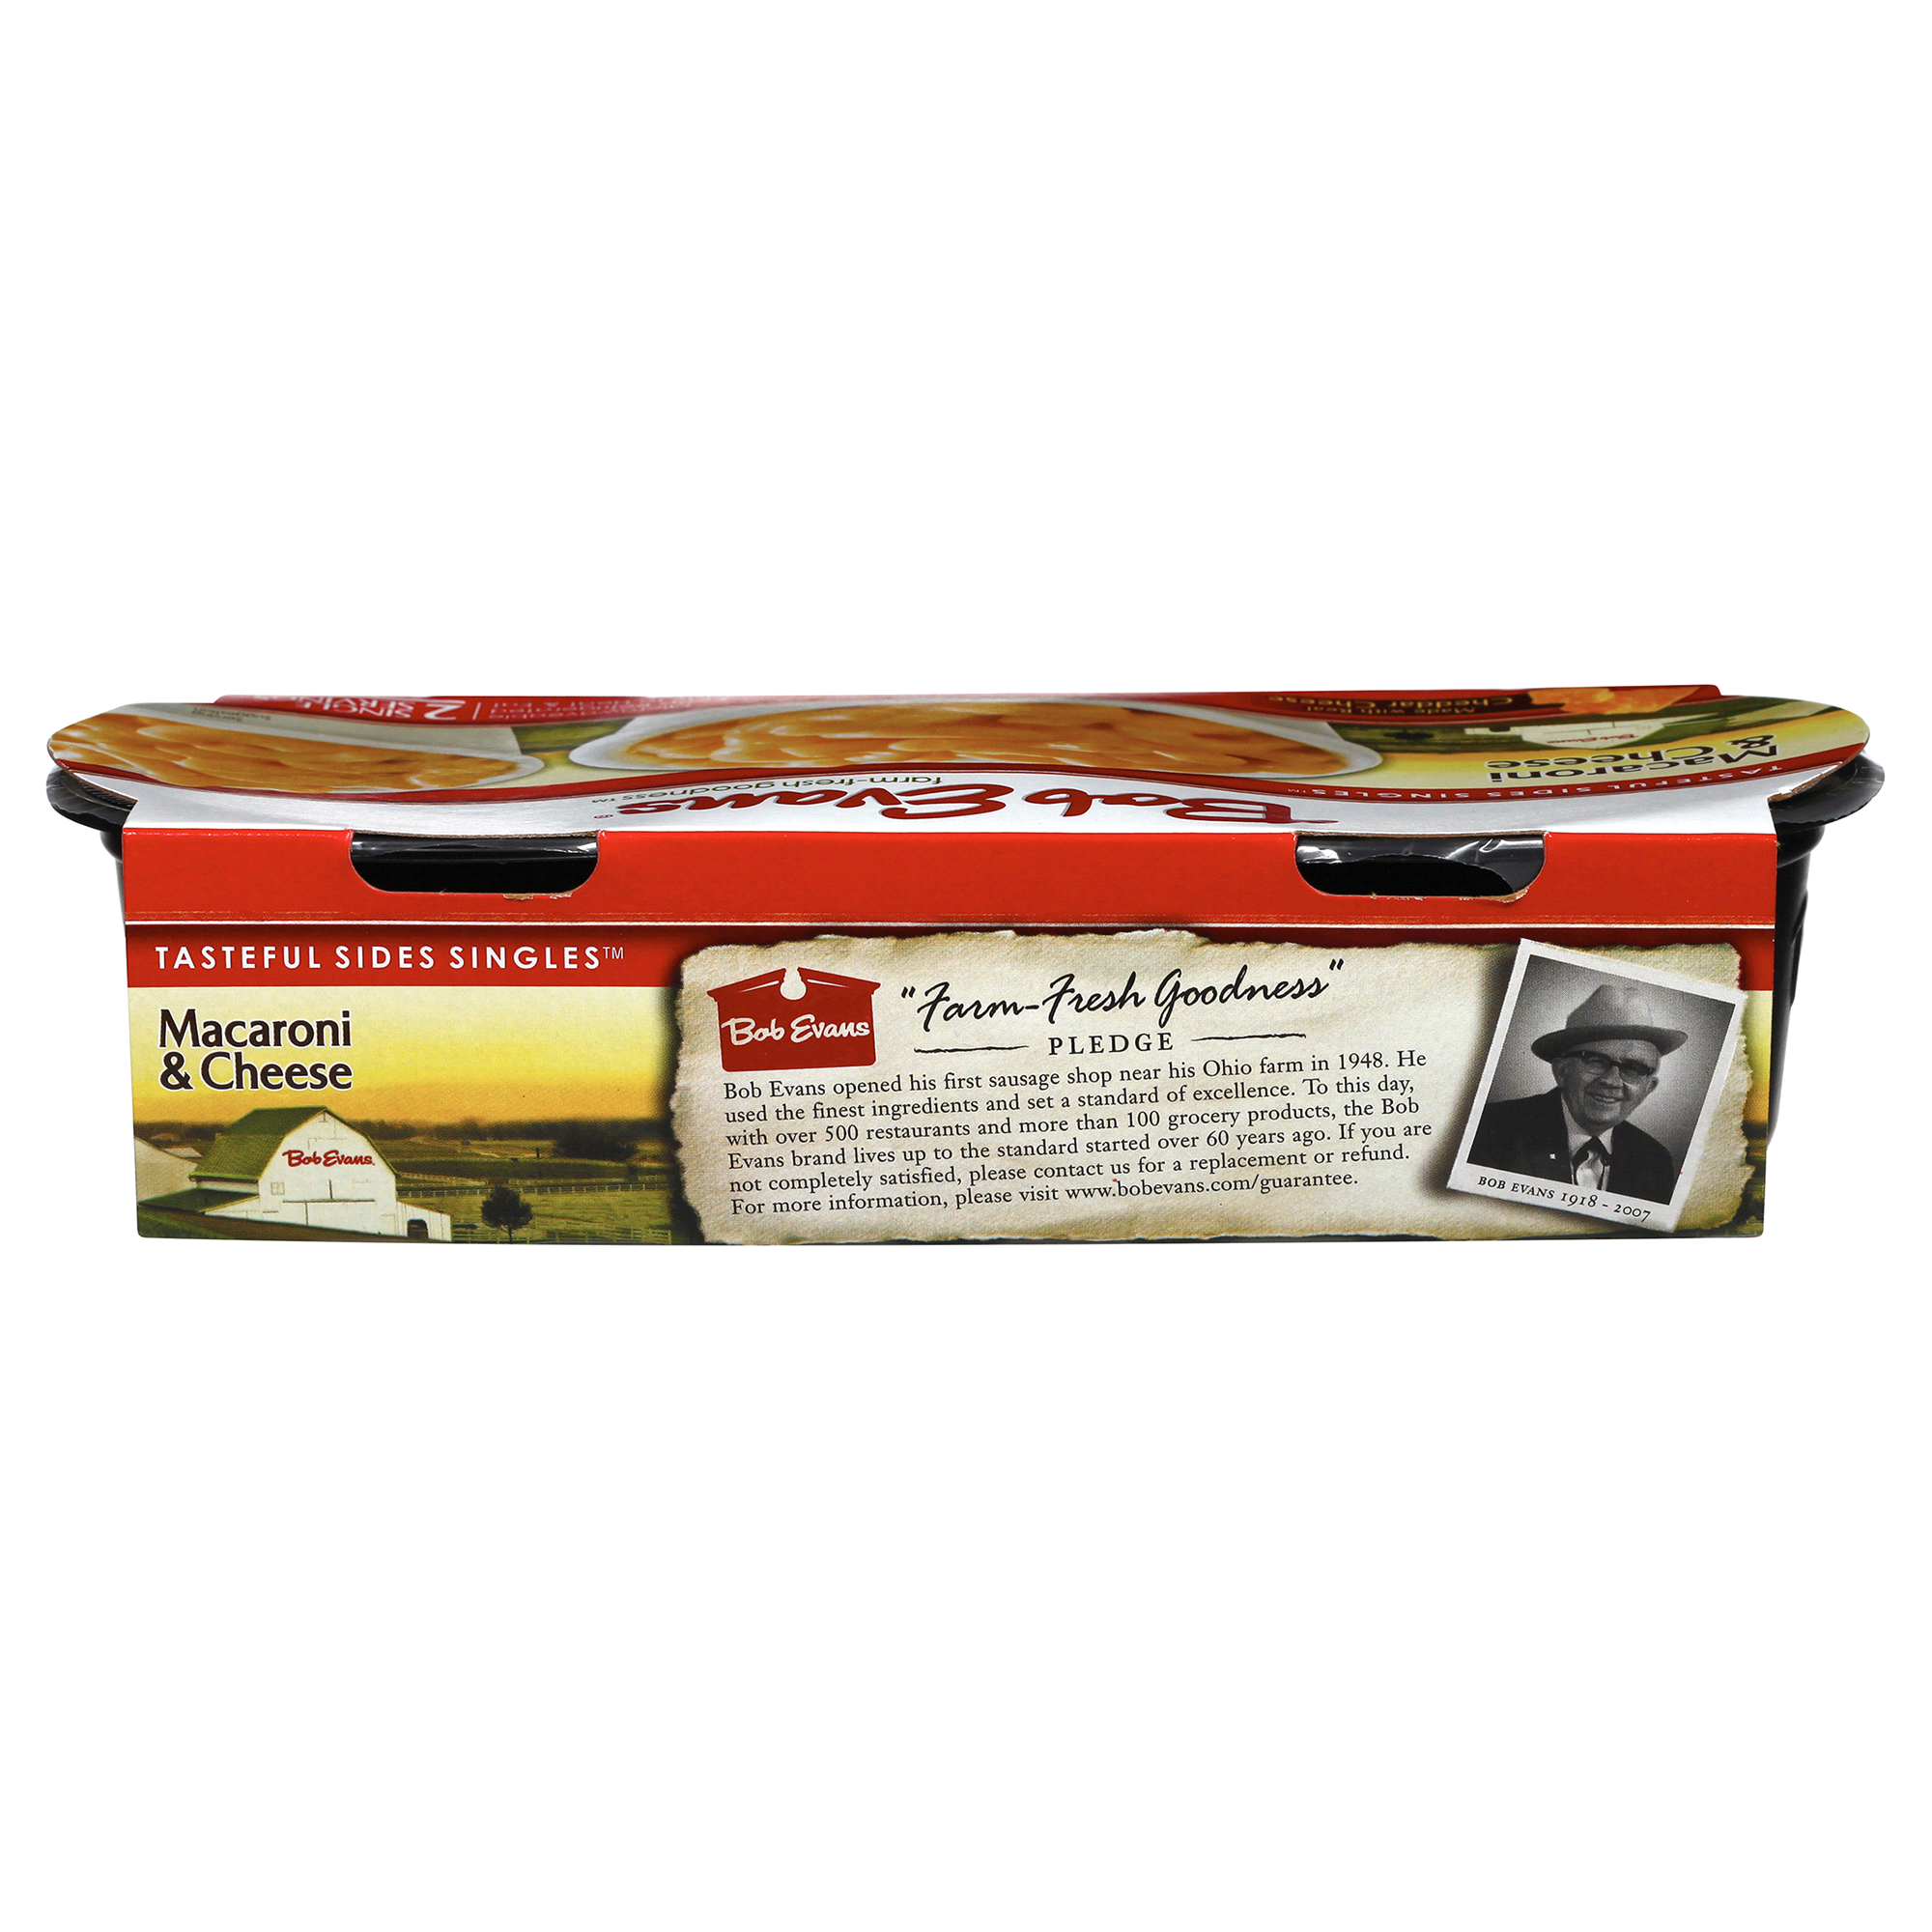 Bob Evans Tasteful Sides Singles Macaroni & Cheese 12 oz   Meijer.com